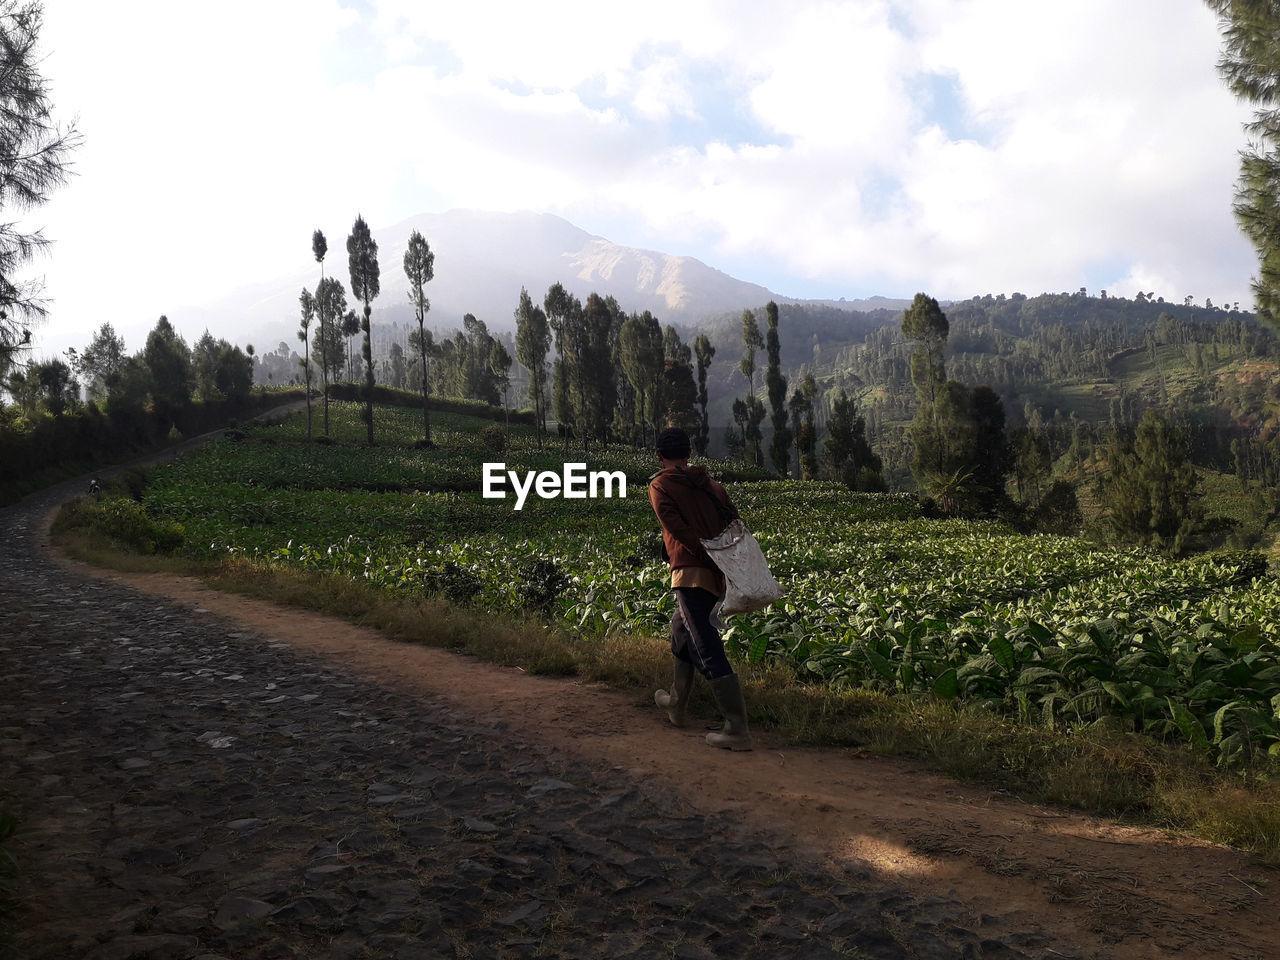 The spirit of gardening wonosobo indonesia